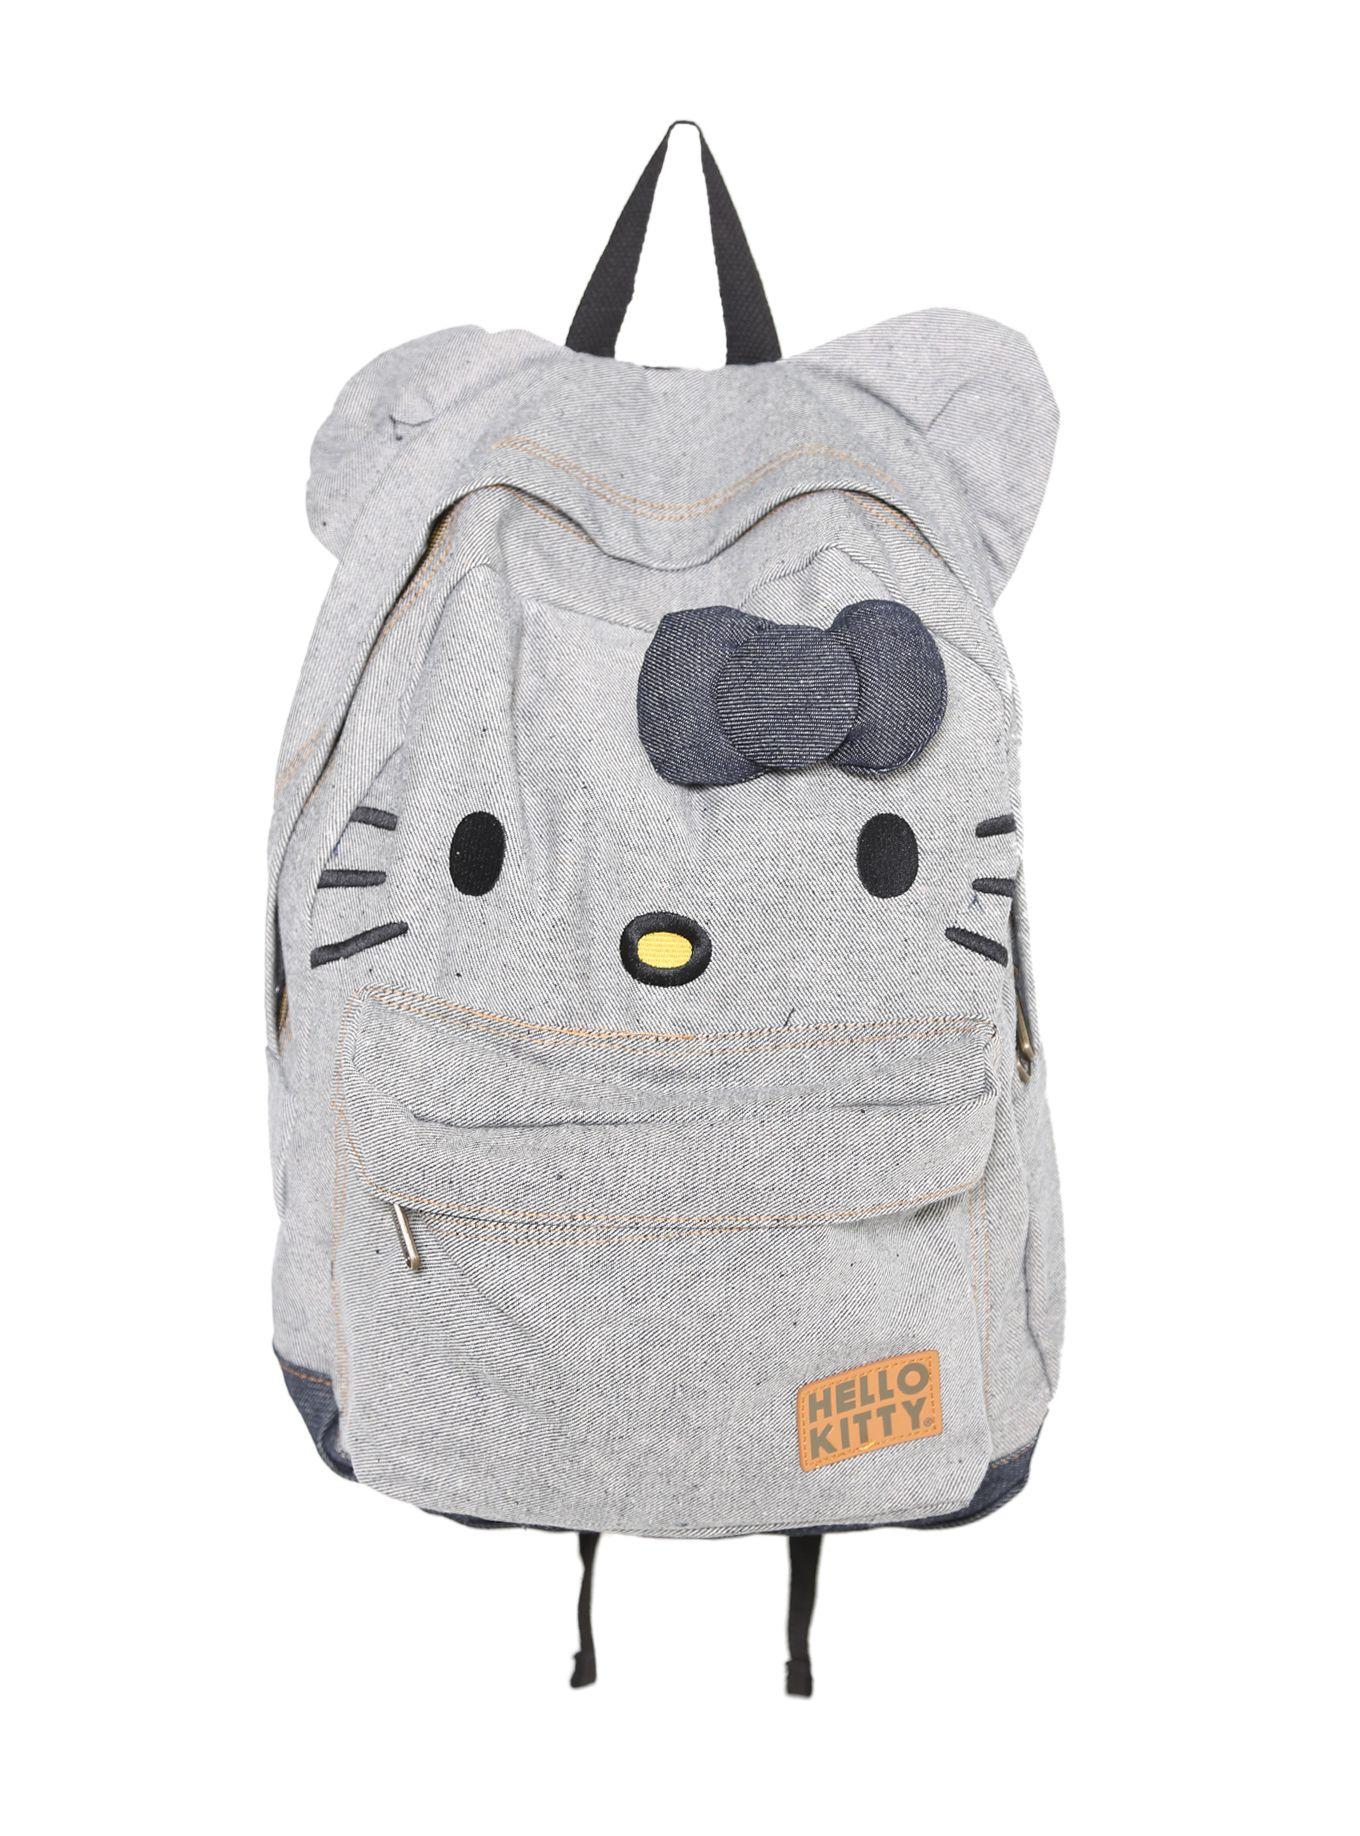 Loungefly Hello Kitty Denim Backpack ( 34.50)   Hello Kitty  3 ... 0b1de14c1d